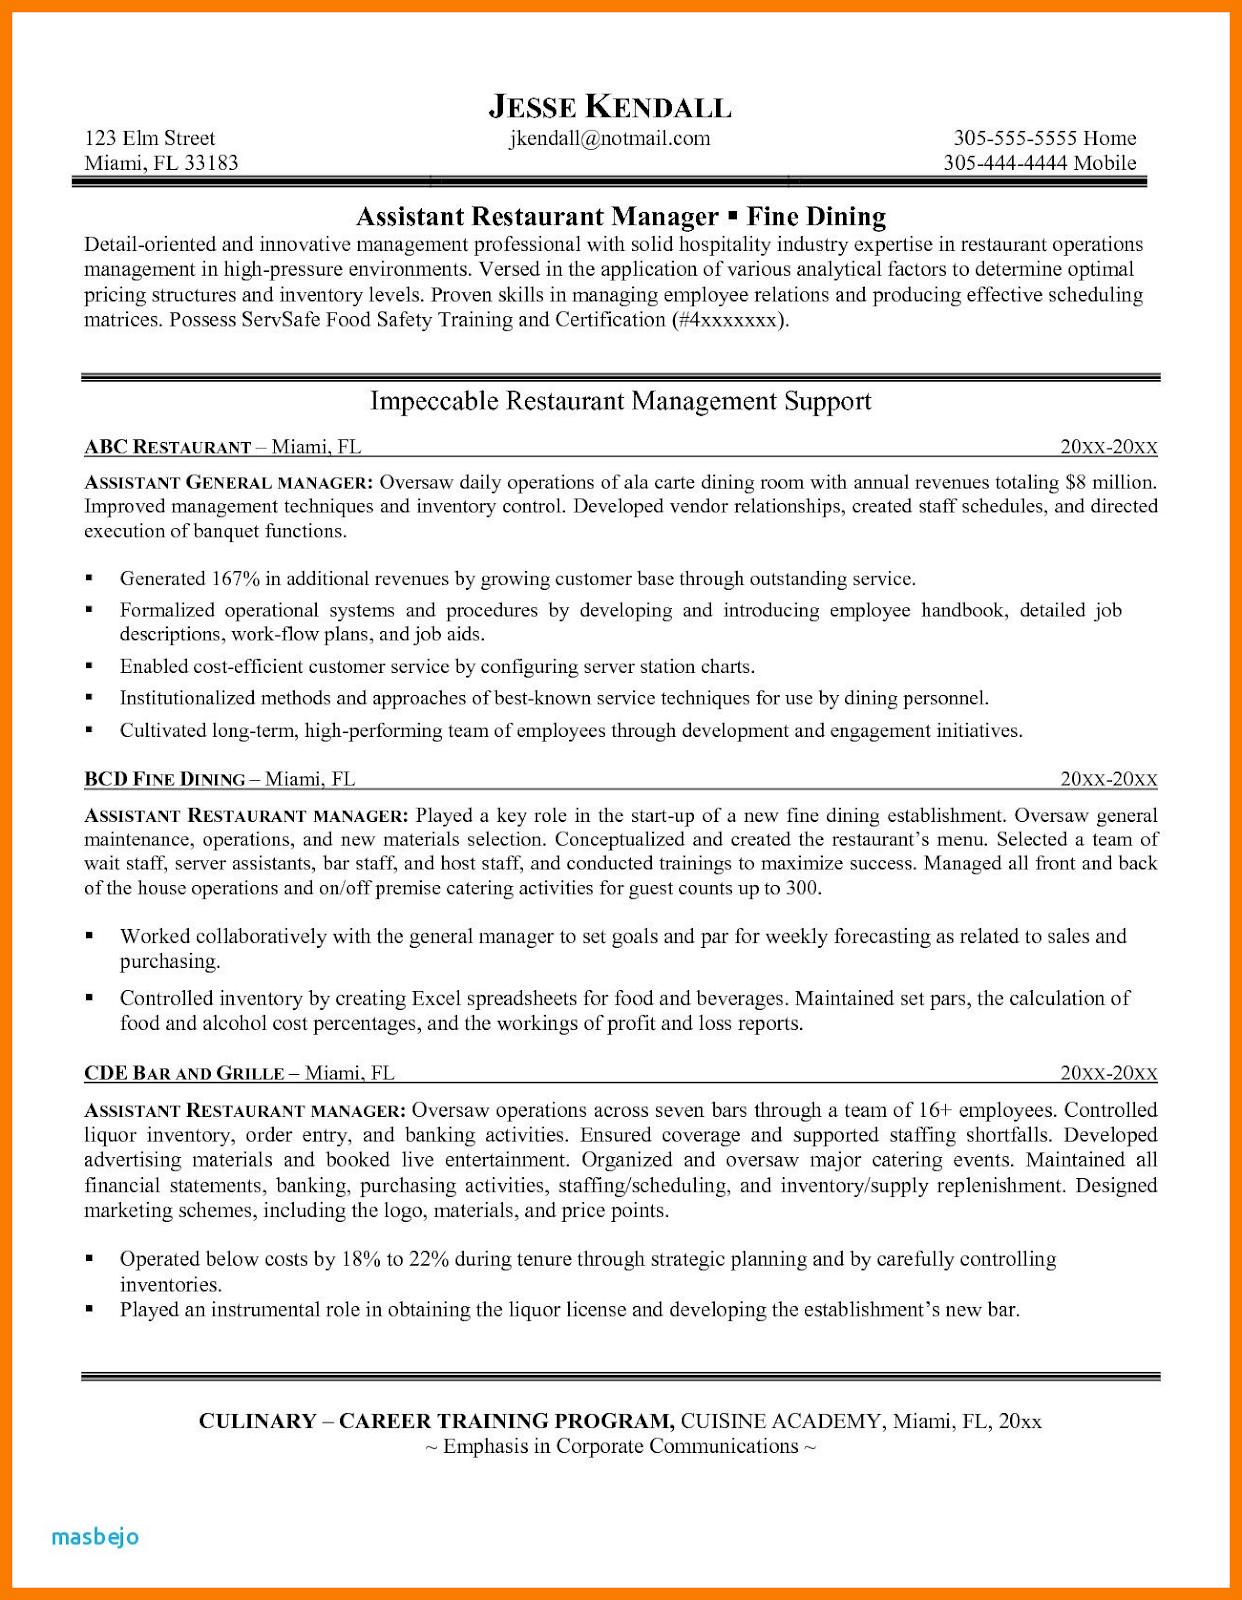 restaurant manager resume sample, restaurant manager